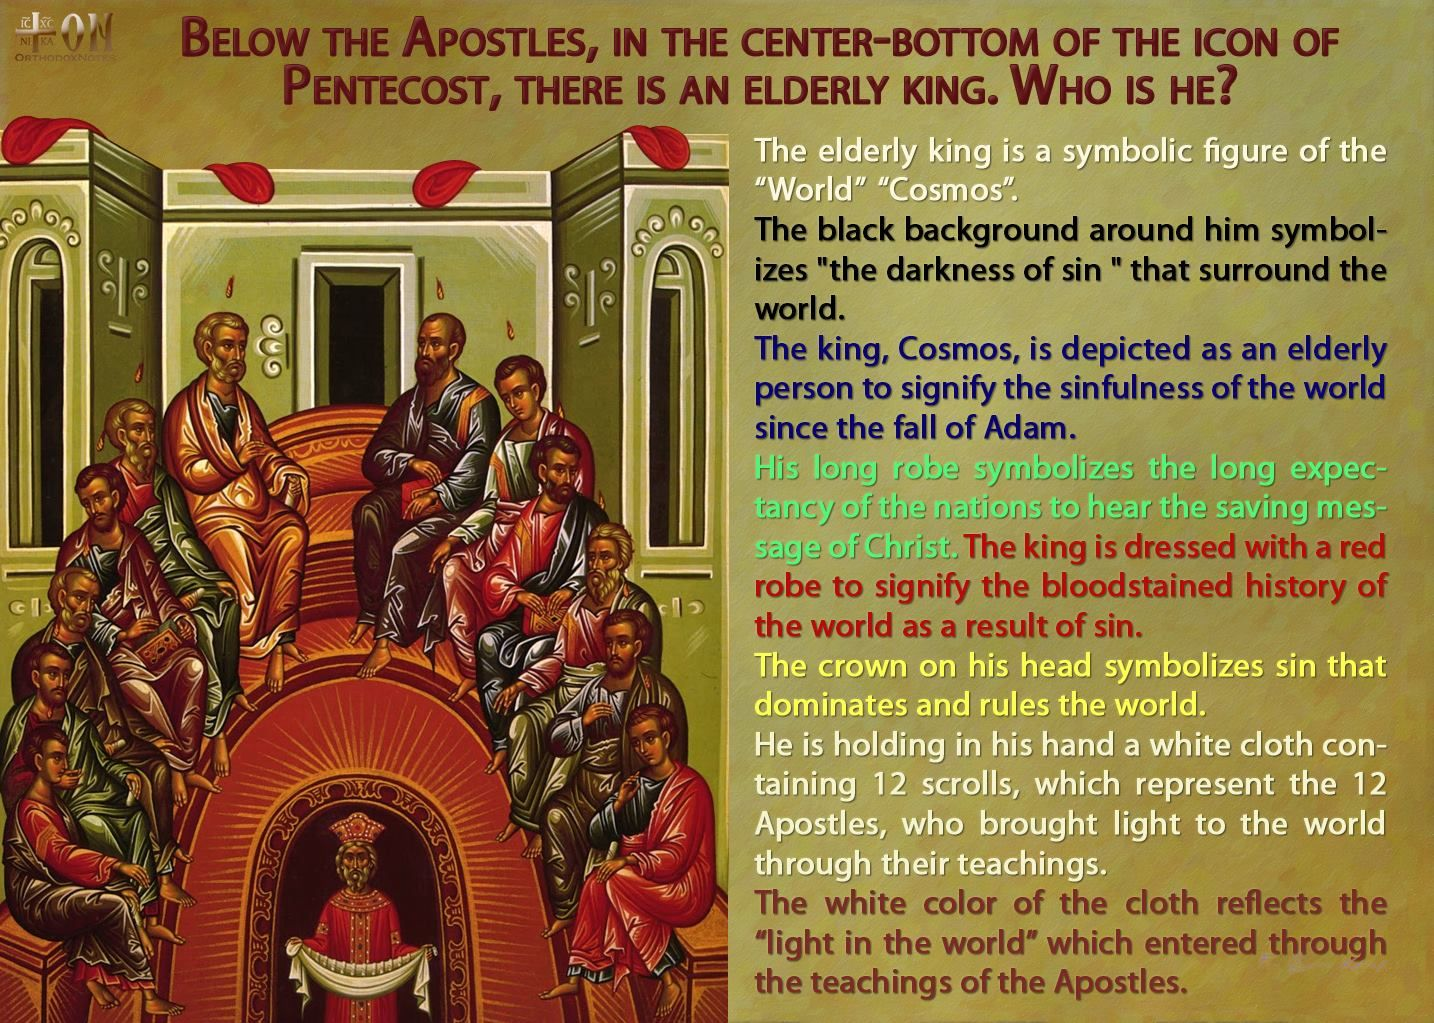 Description Of A Common Orthodox Icon Of The Apostles